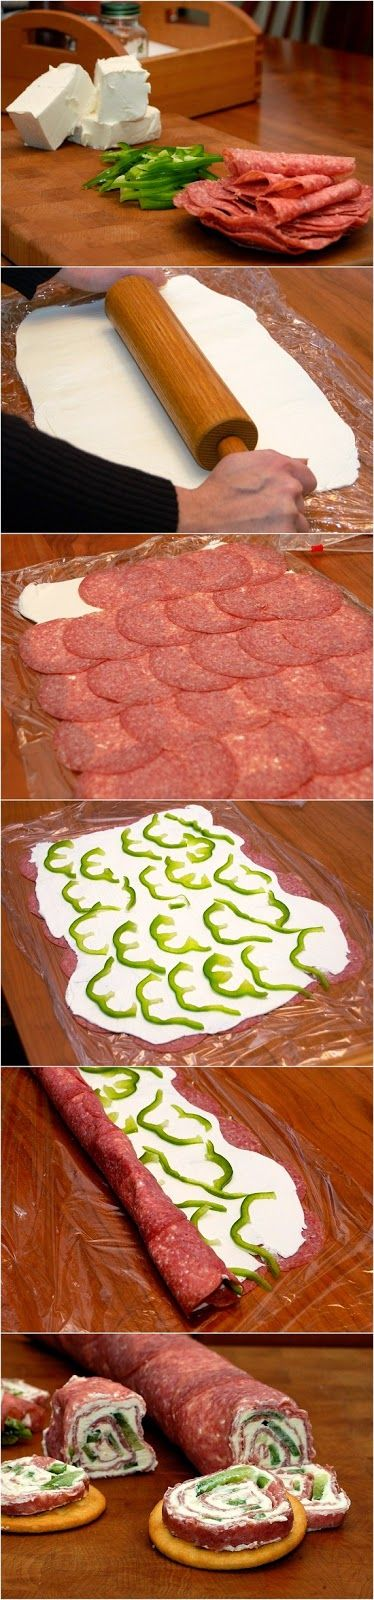 salami and cheese rollups